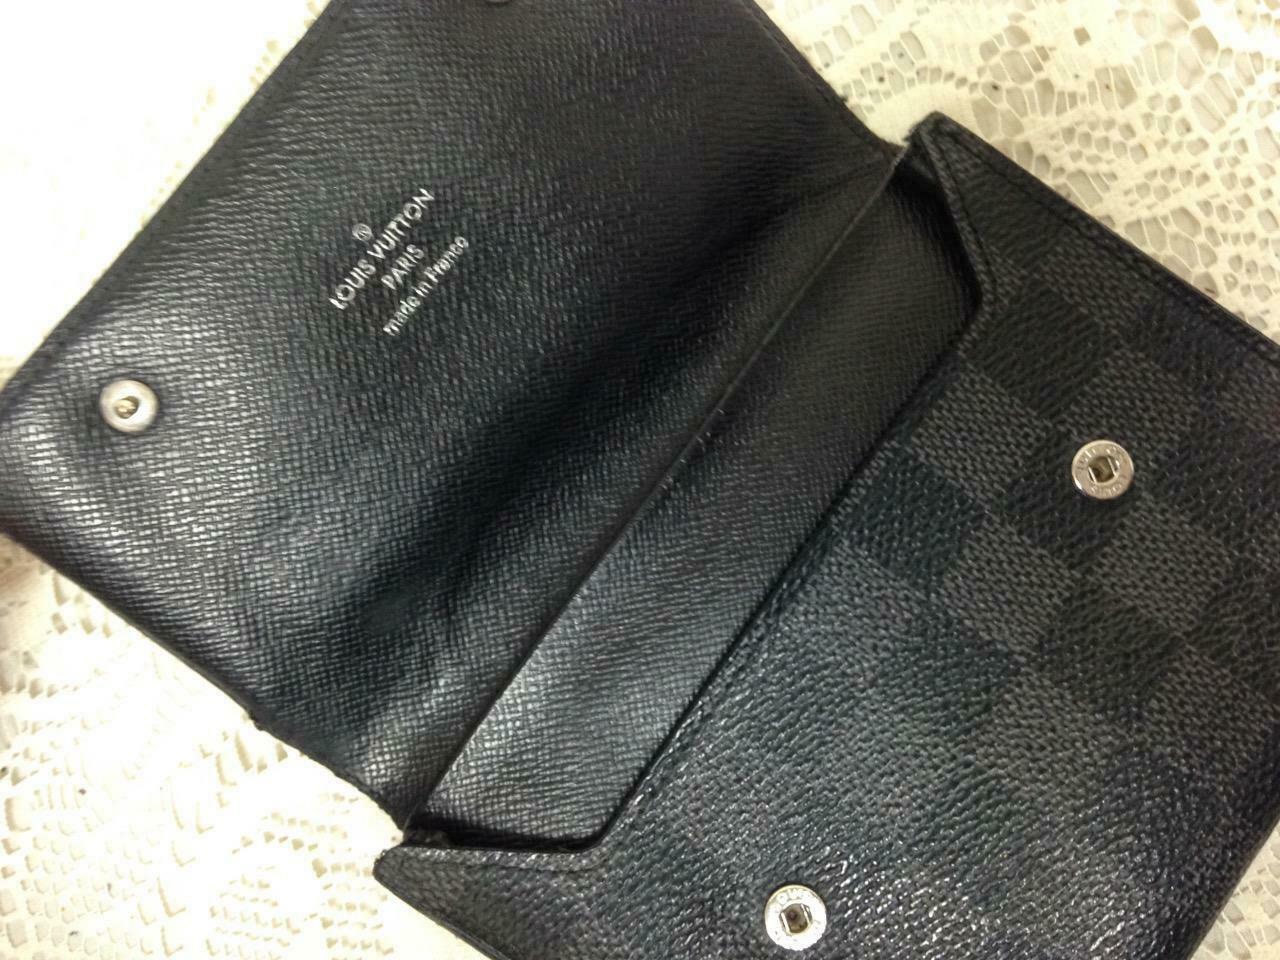 Authentic Louis Vuitton Graphite Damier Canvas Leather Unisex Wallet 5.5inx4.5in - $189.95